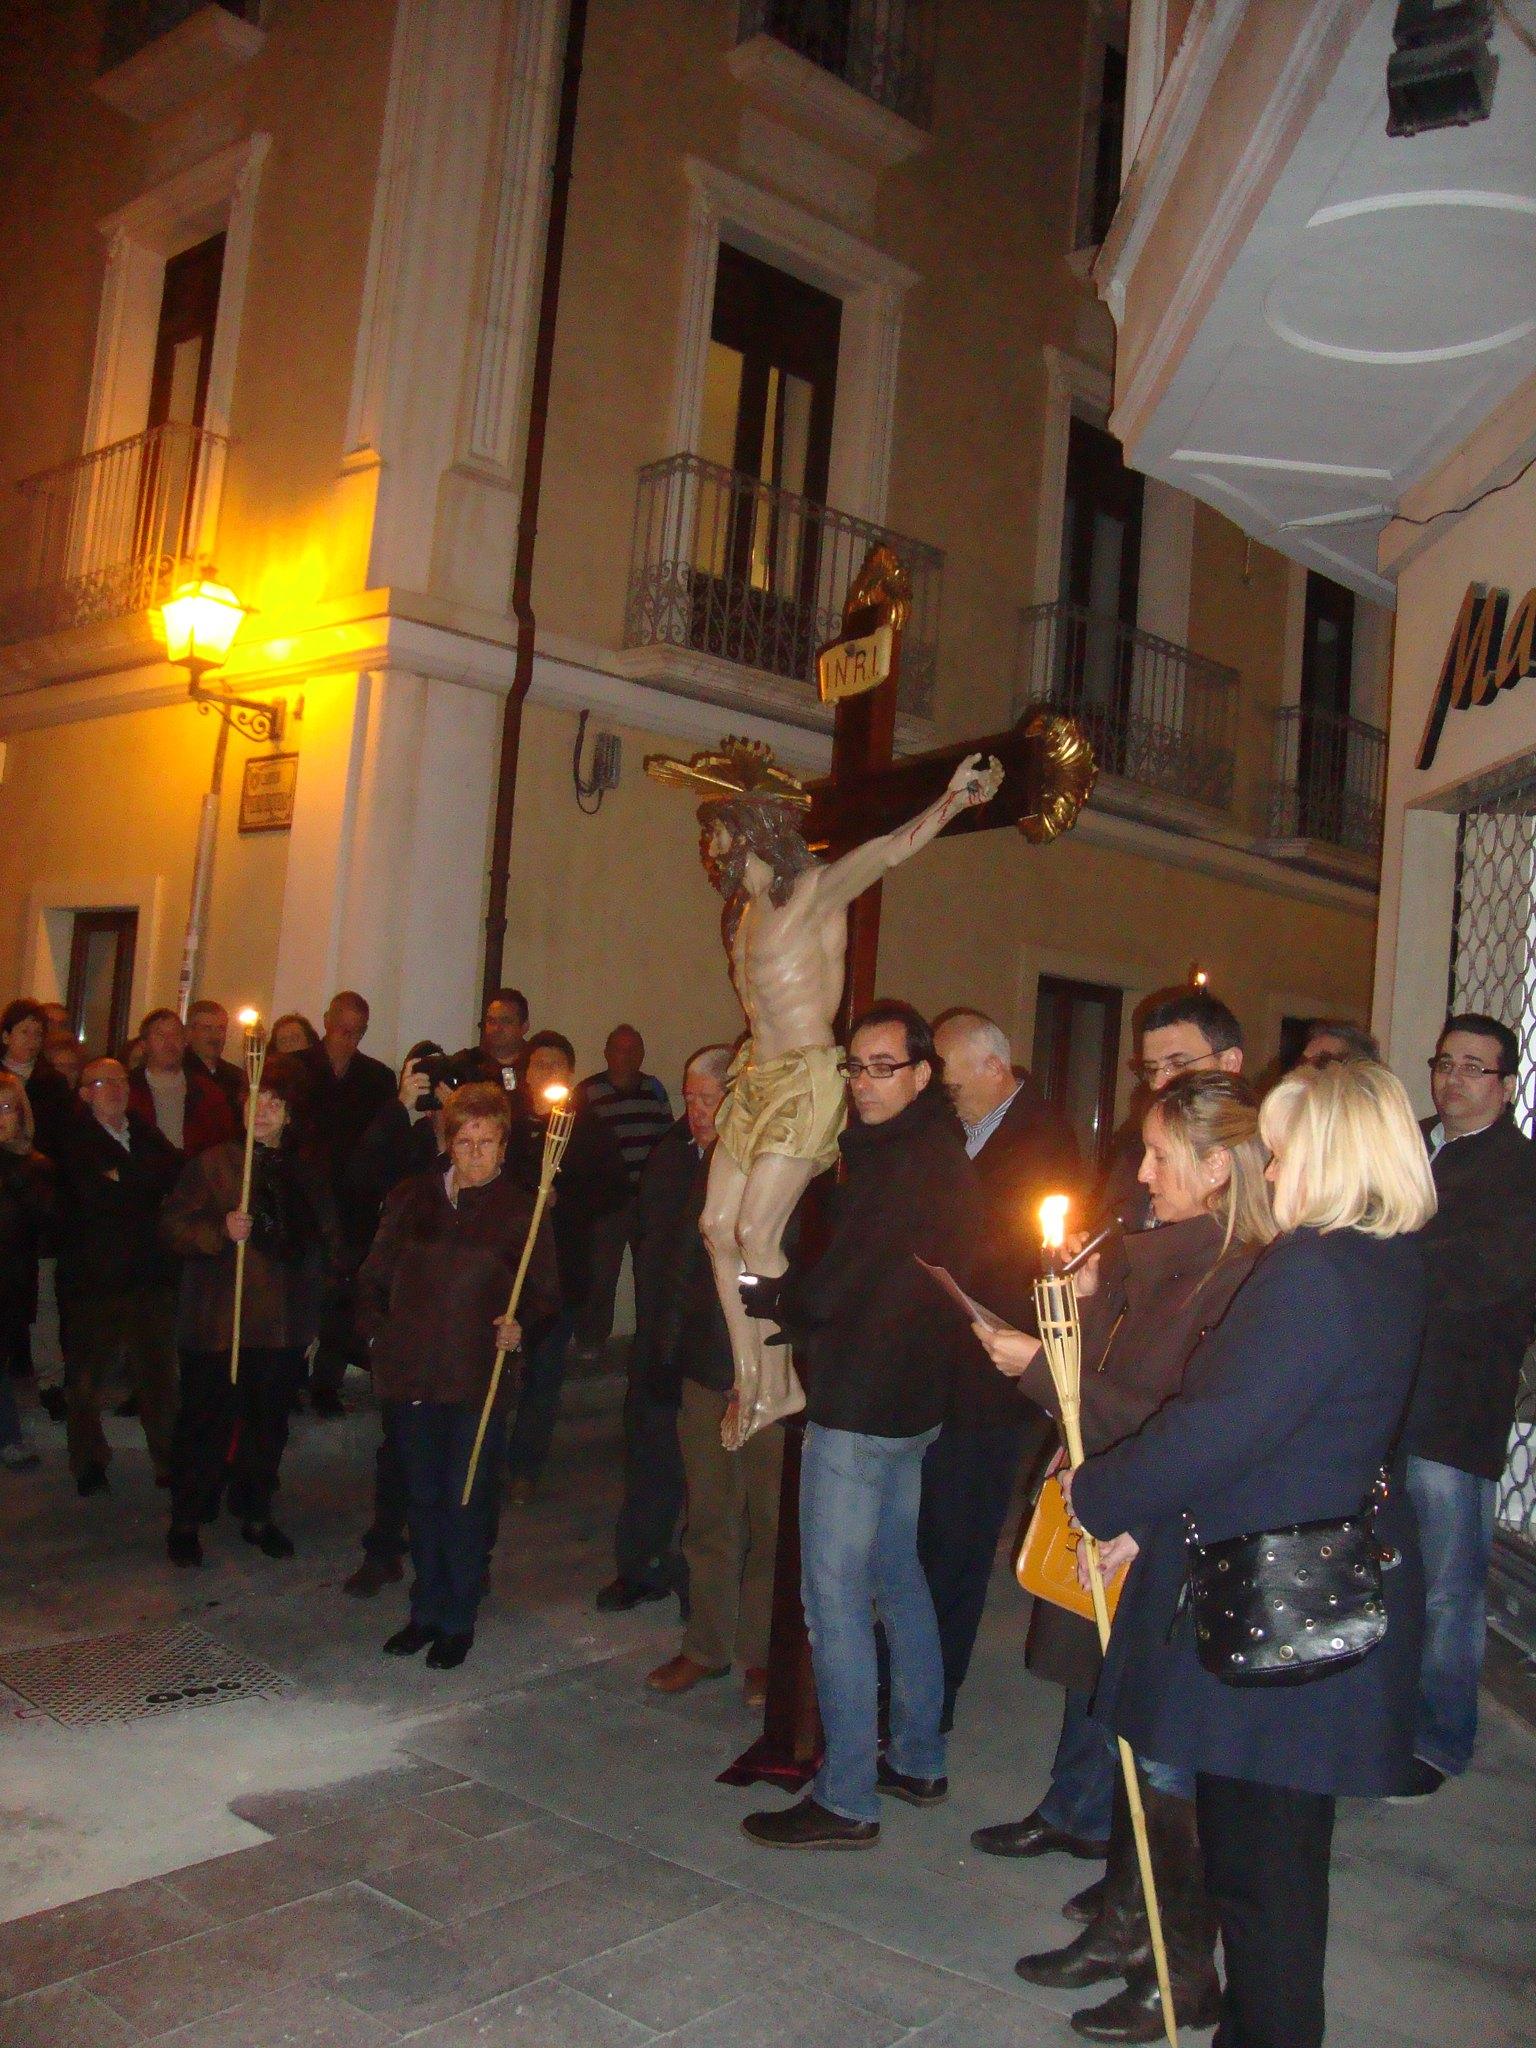 (2013-03-22) - IV Vía Crucis nocturno - Javier Montesinos Villaplana (02)